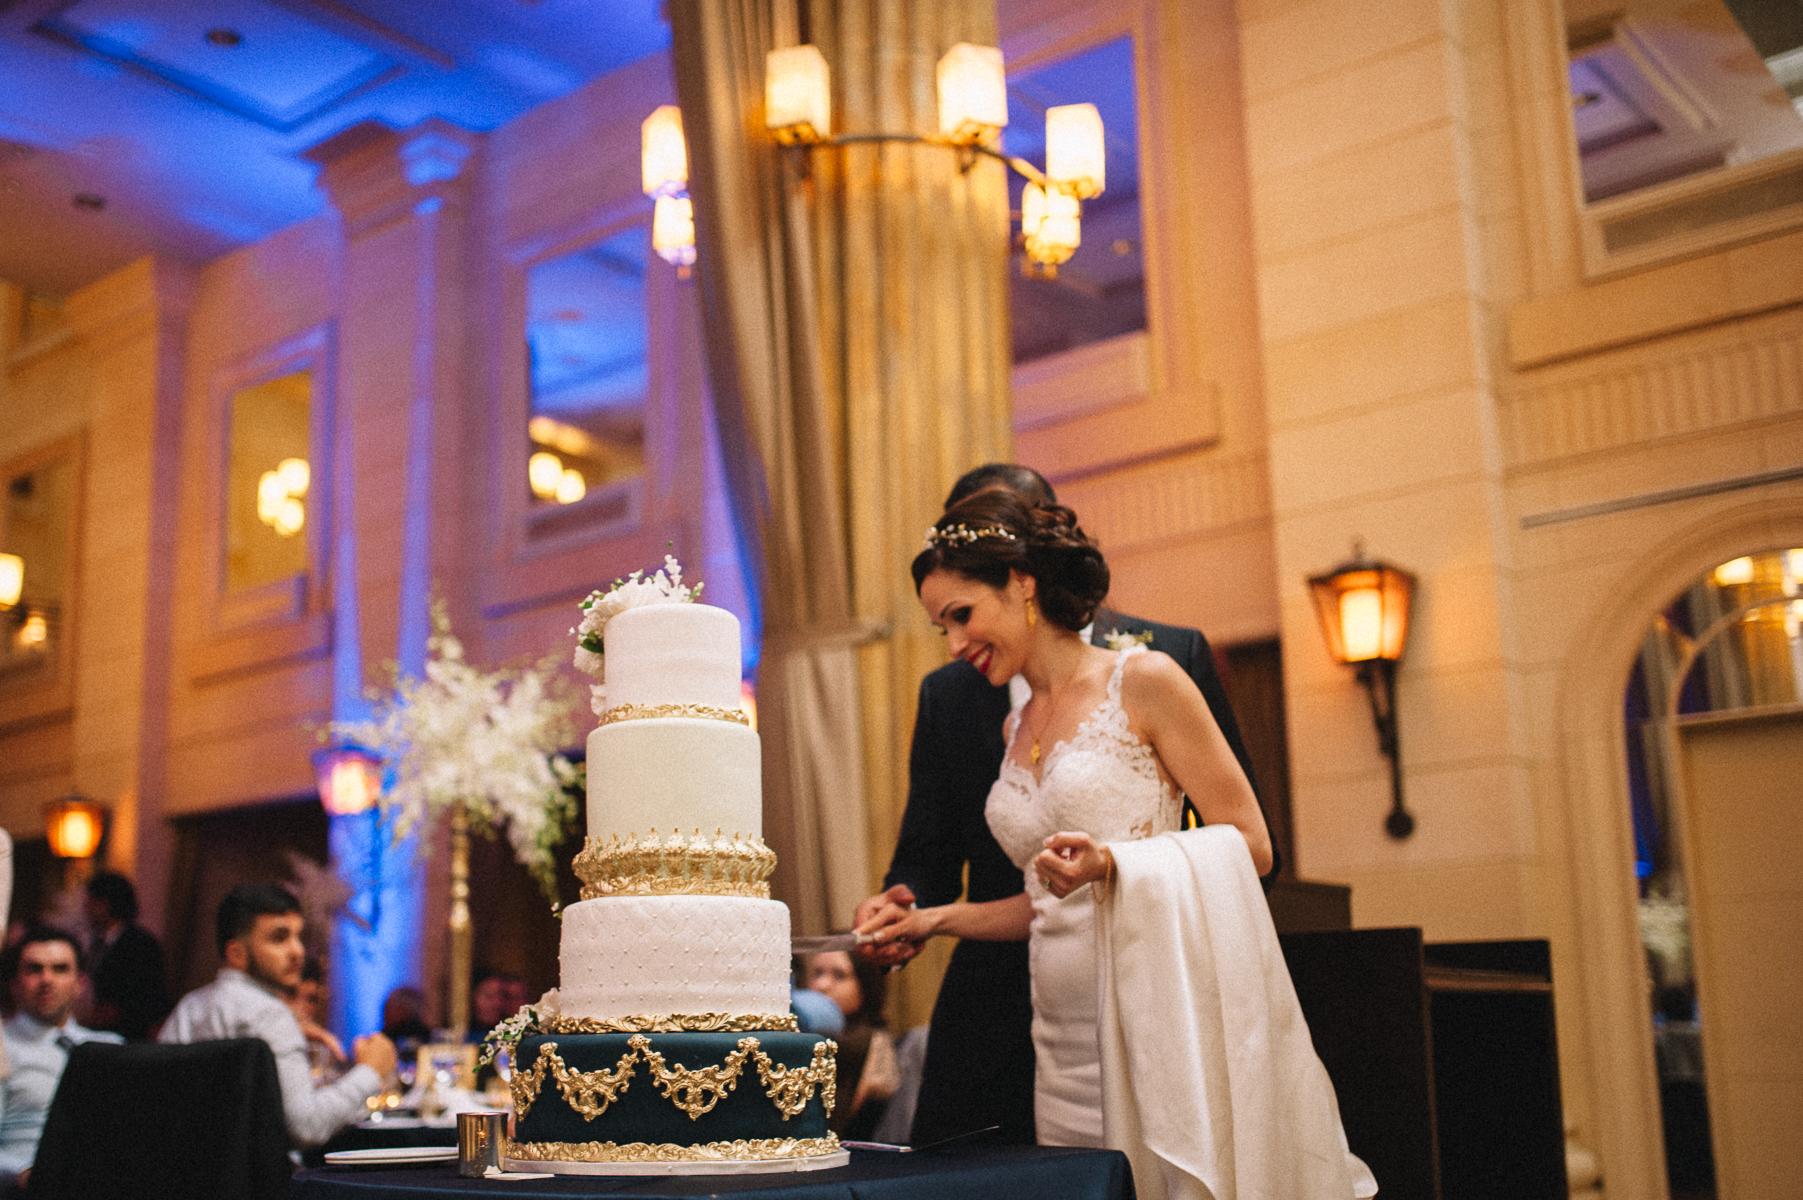 Windsor Arm Wedding by Hennygraphy (234 of 250)